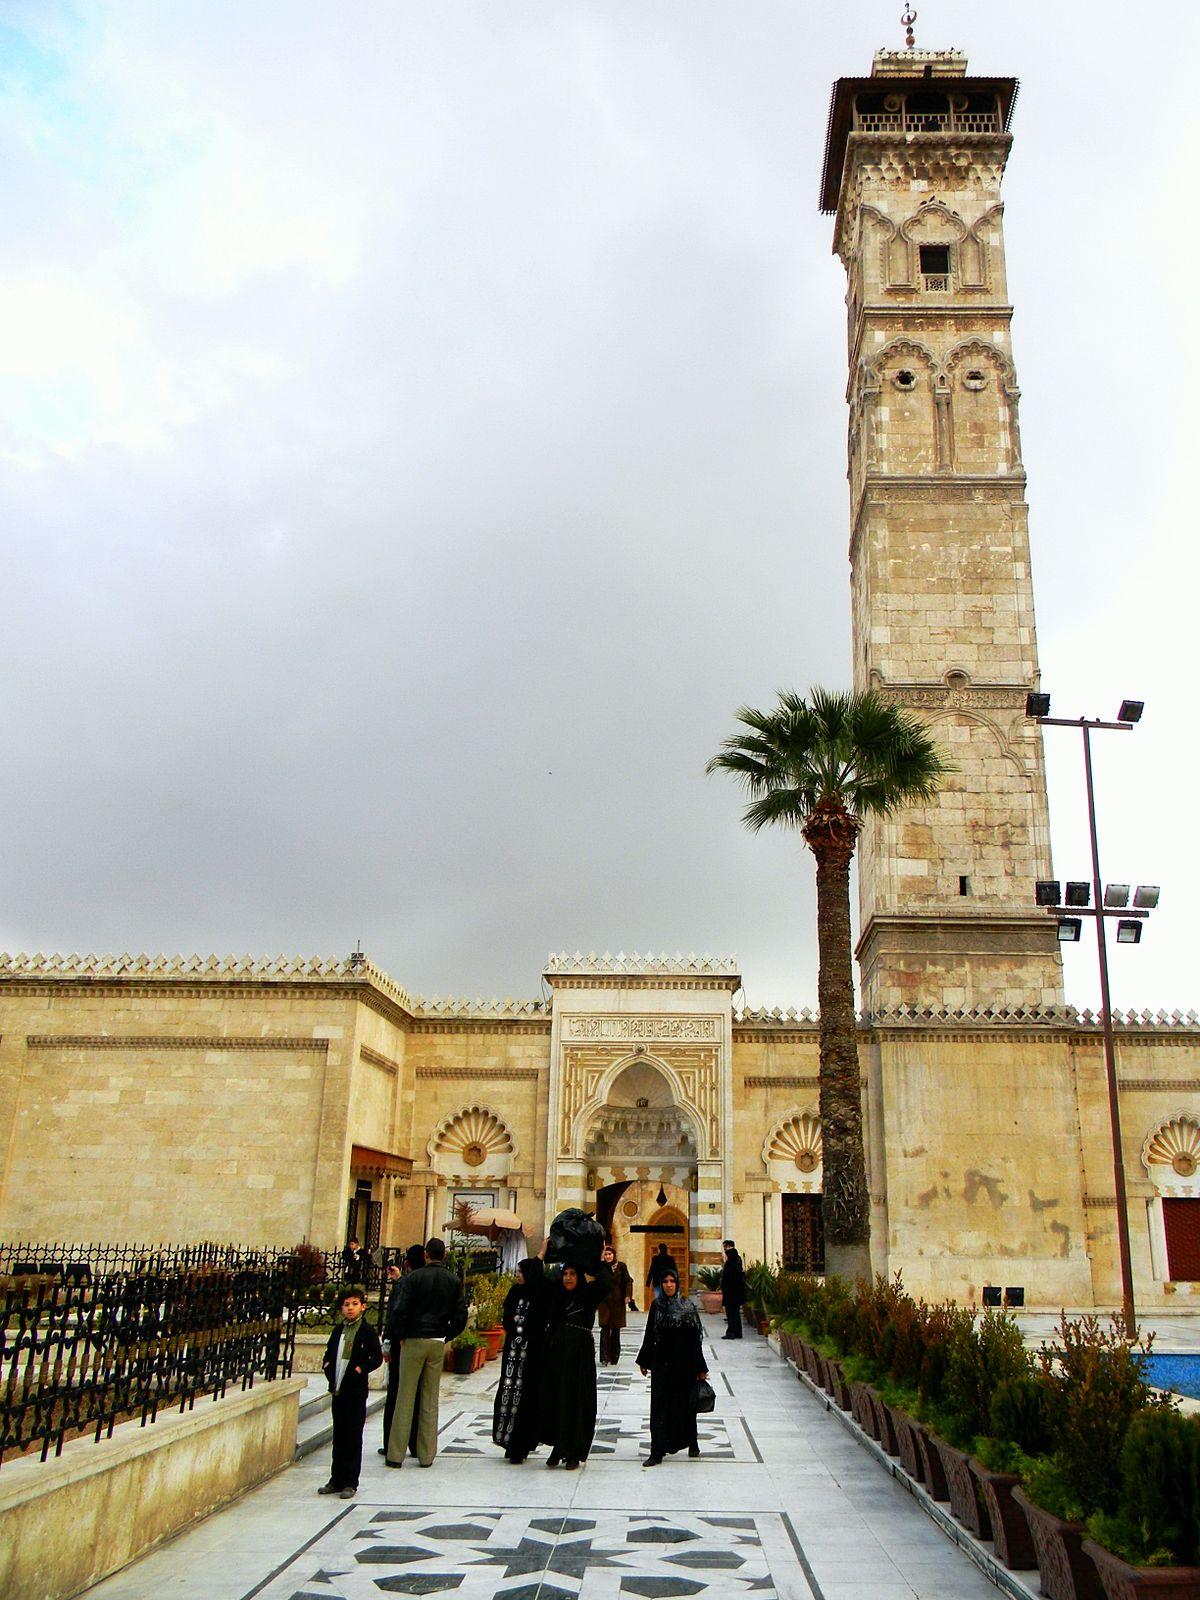 Great Mosque of Aleppo - Wikipedia